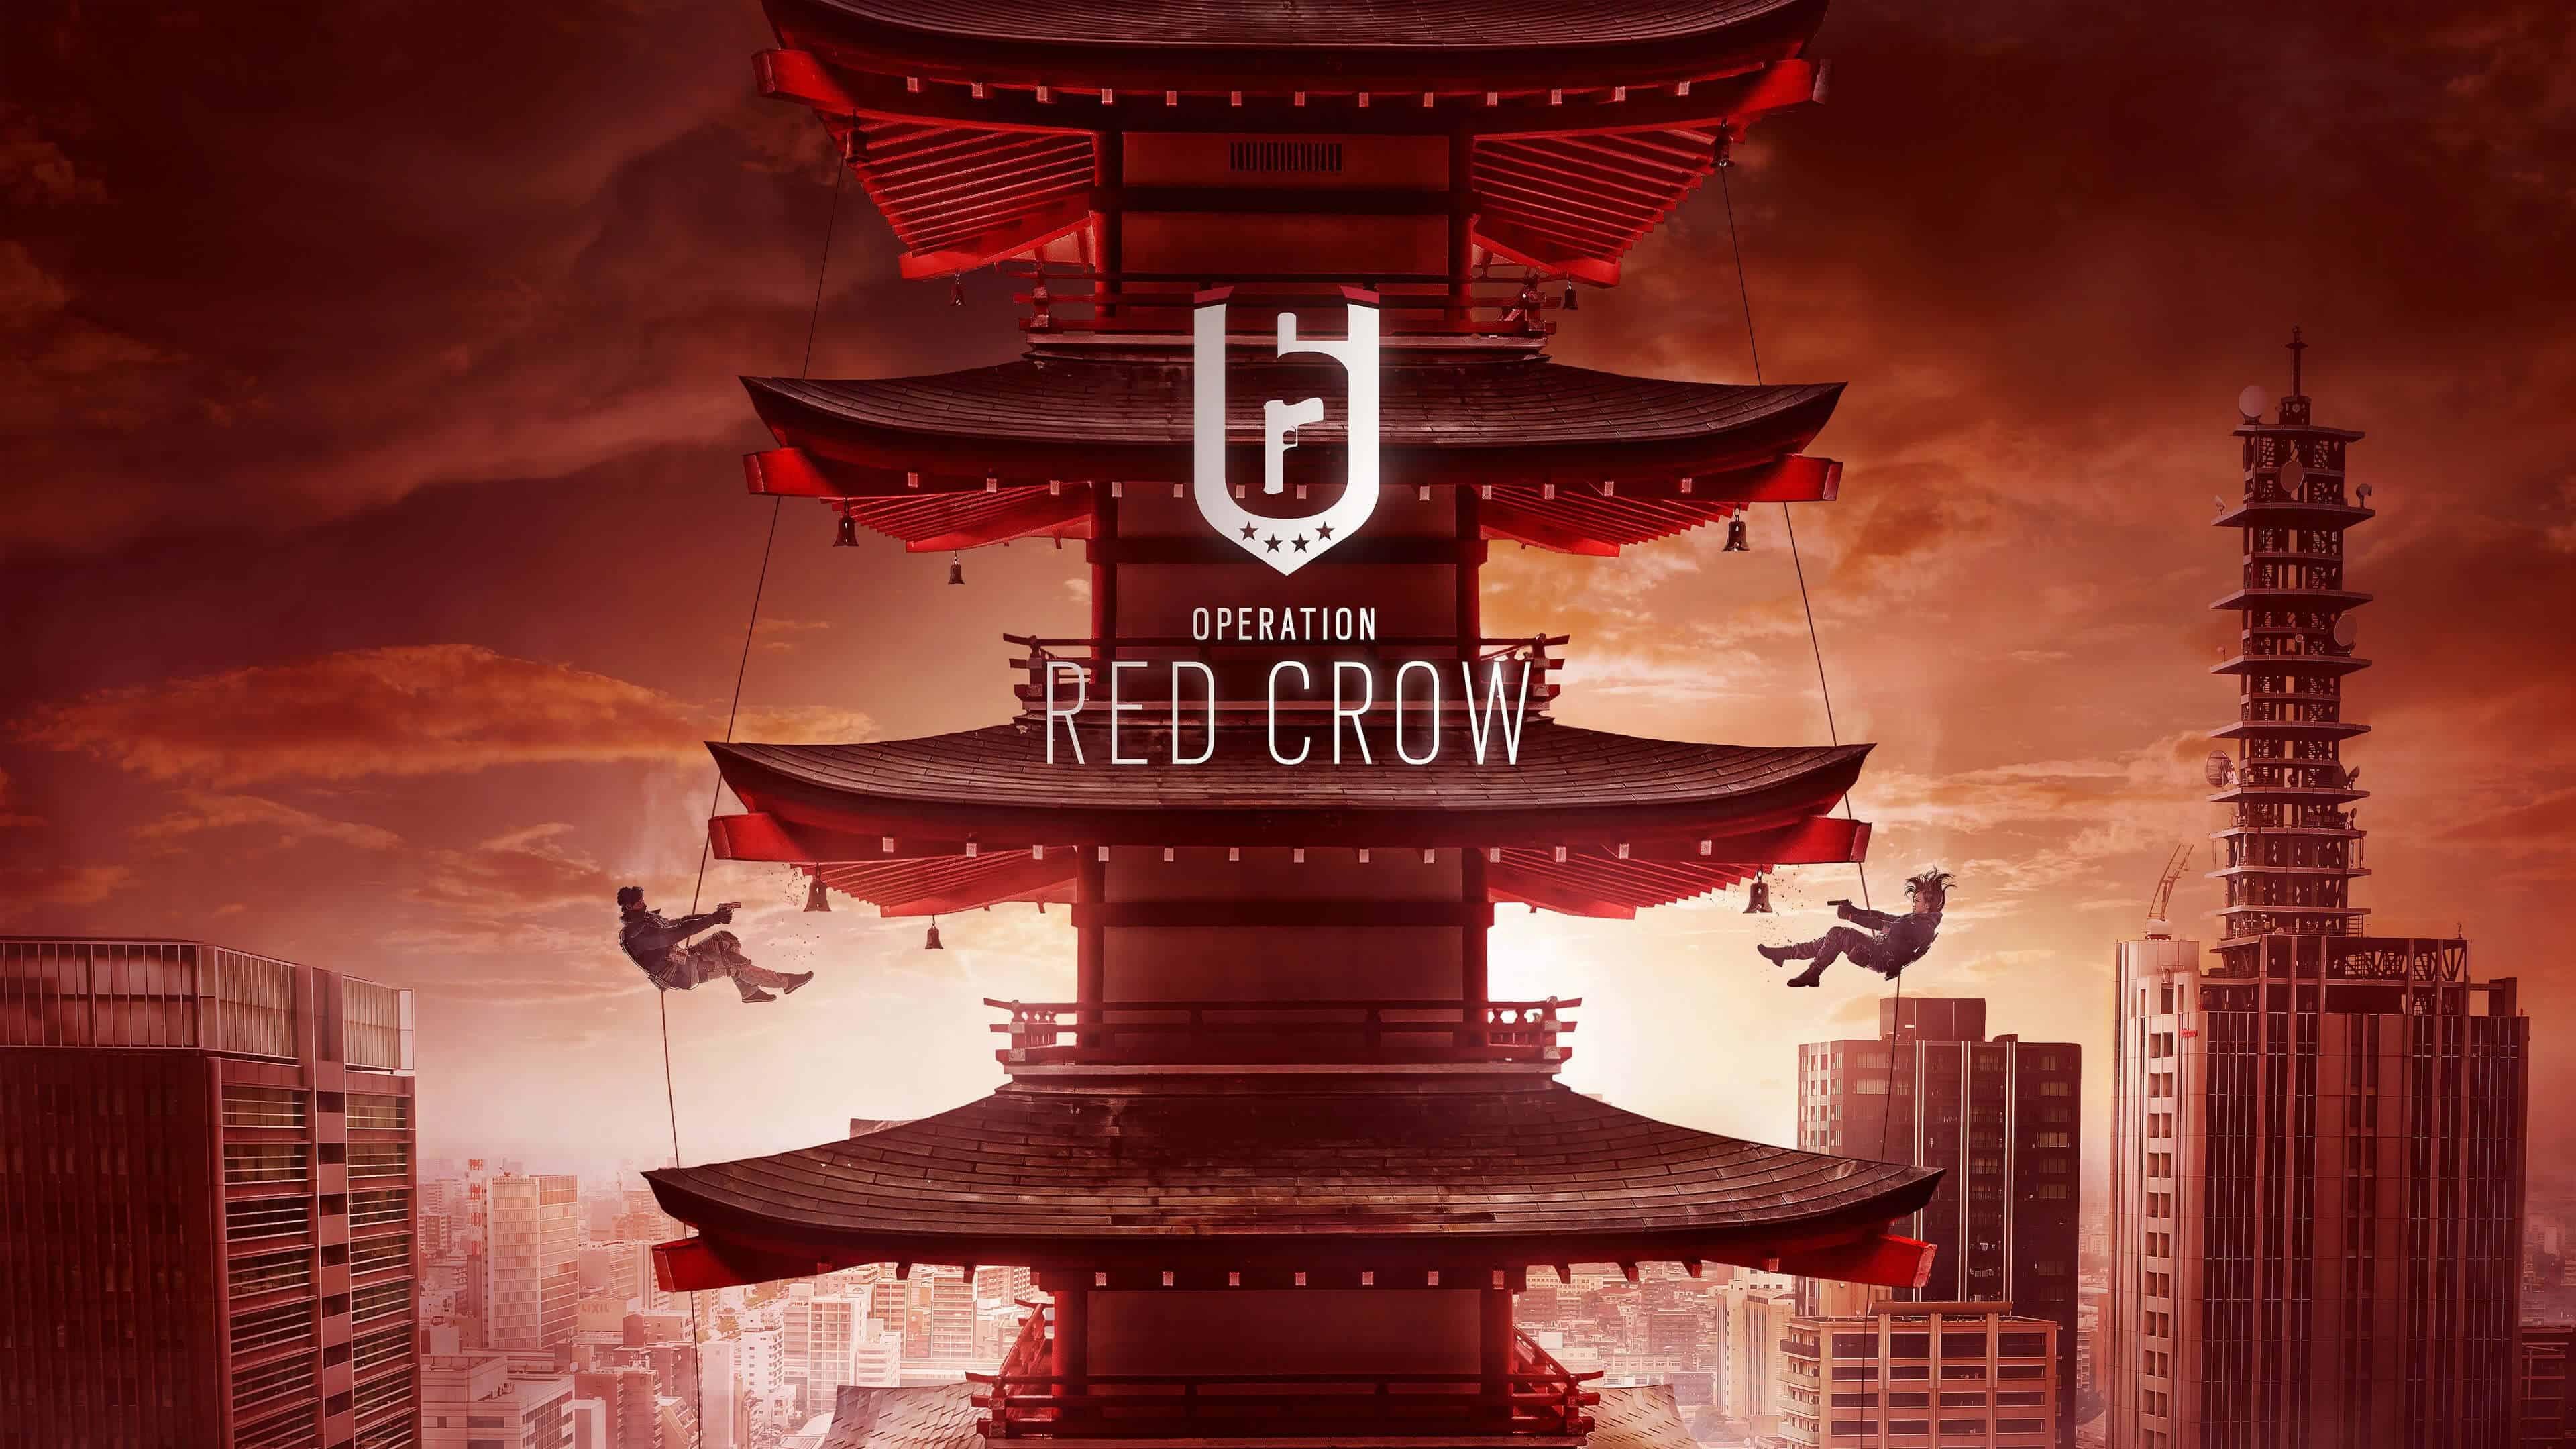 Tom Clancy's: Rainbow Six Siege Operation Red Crow UHD 4K